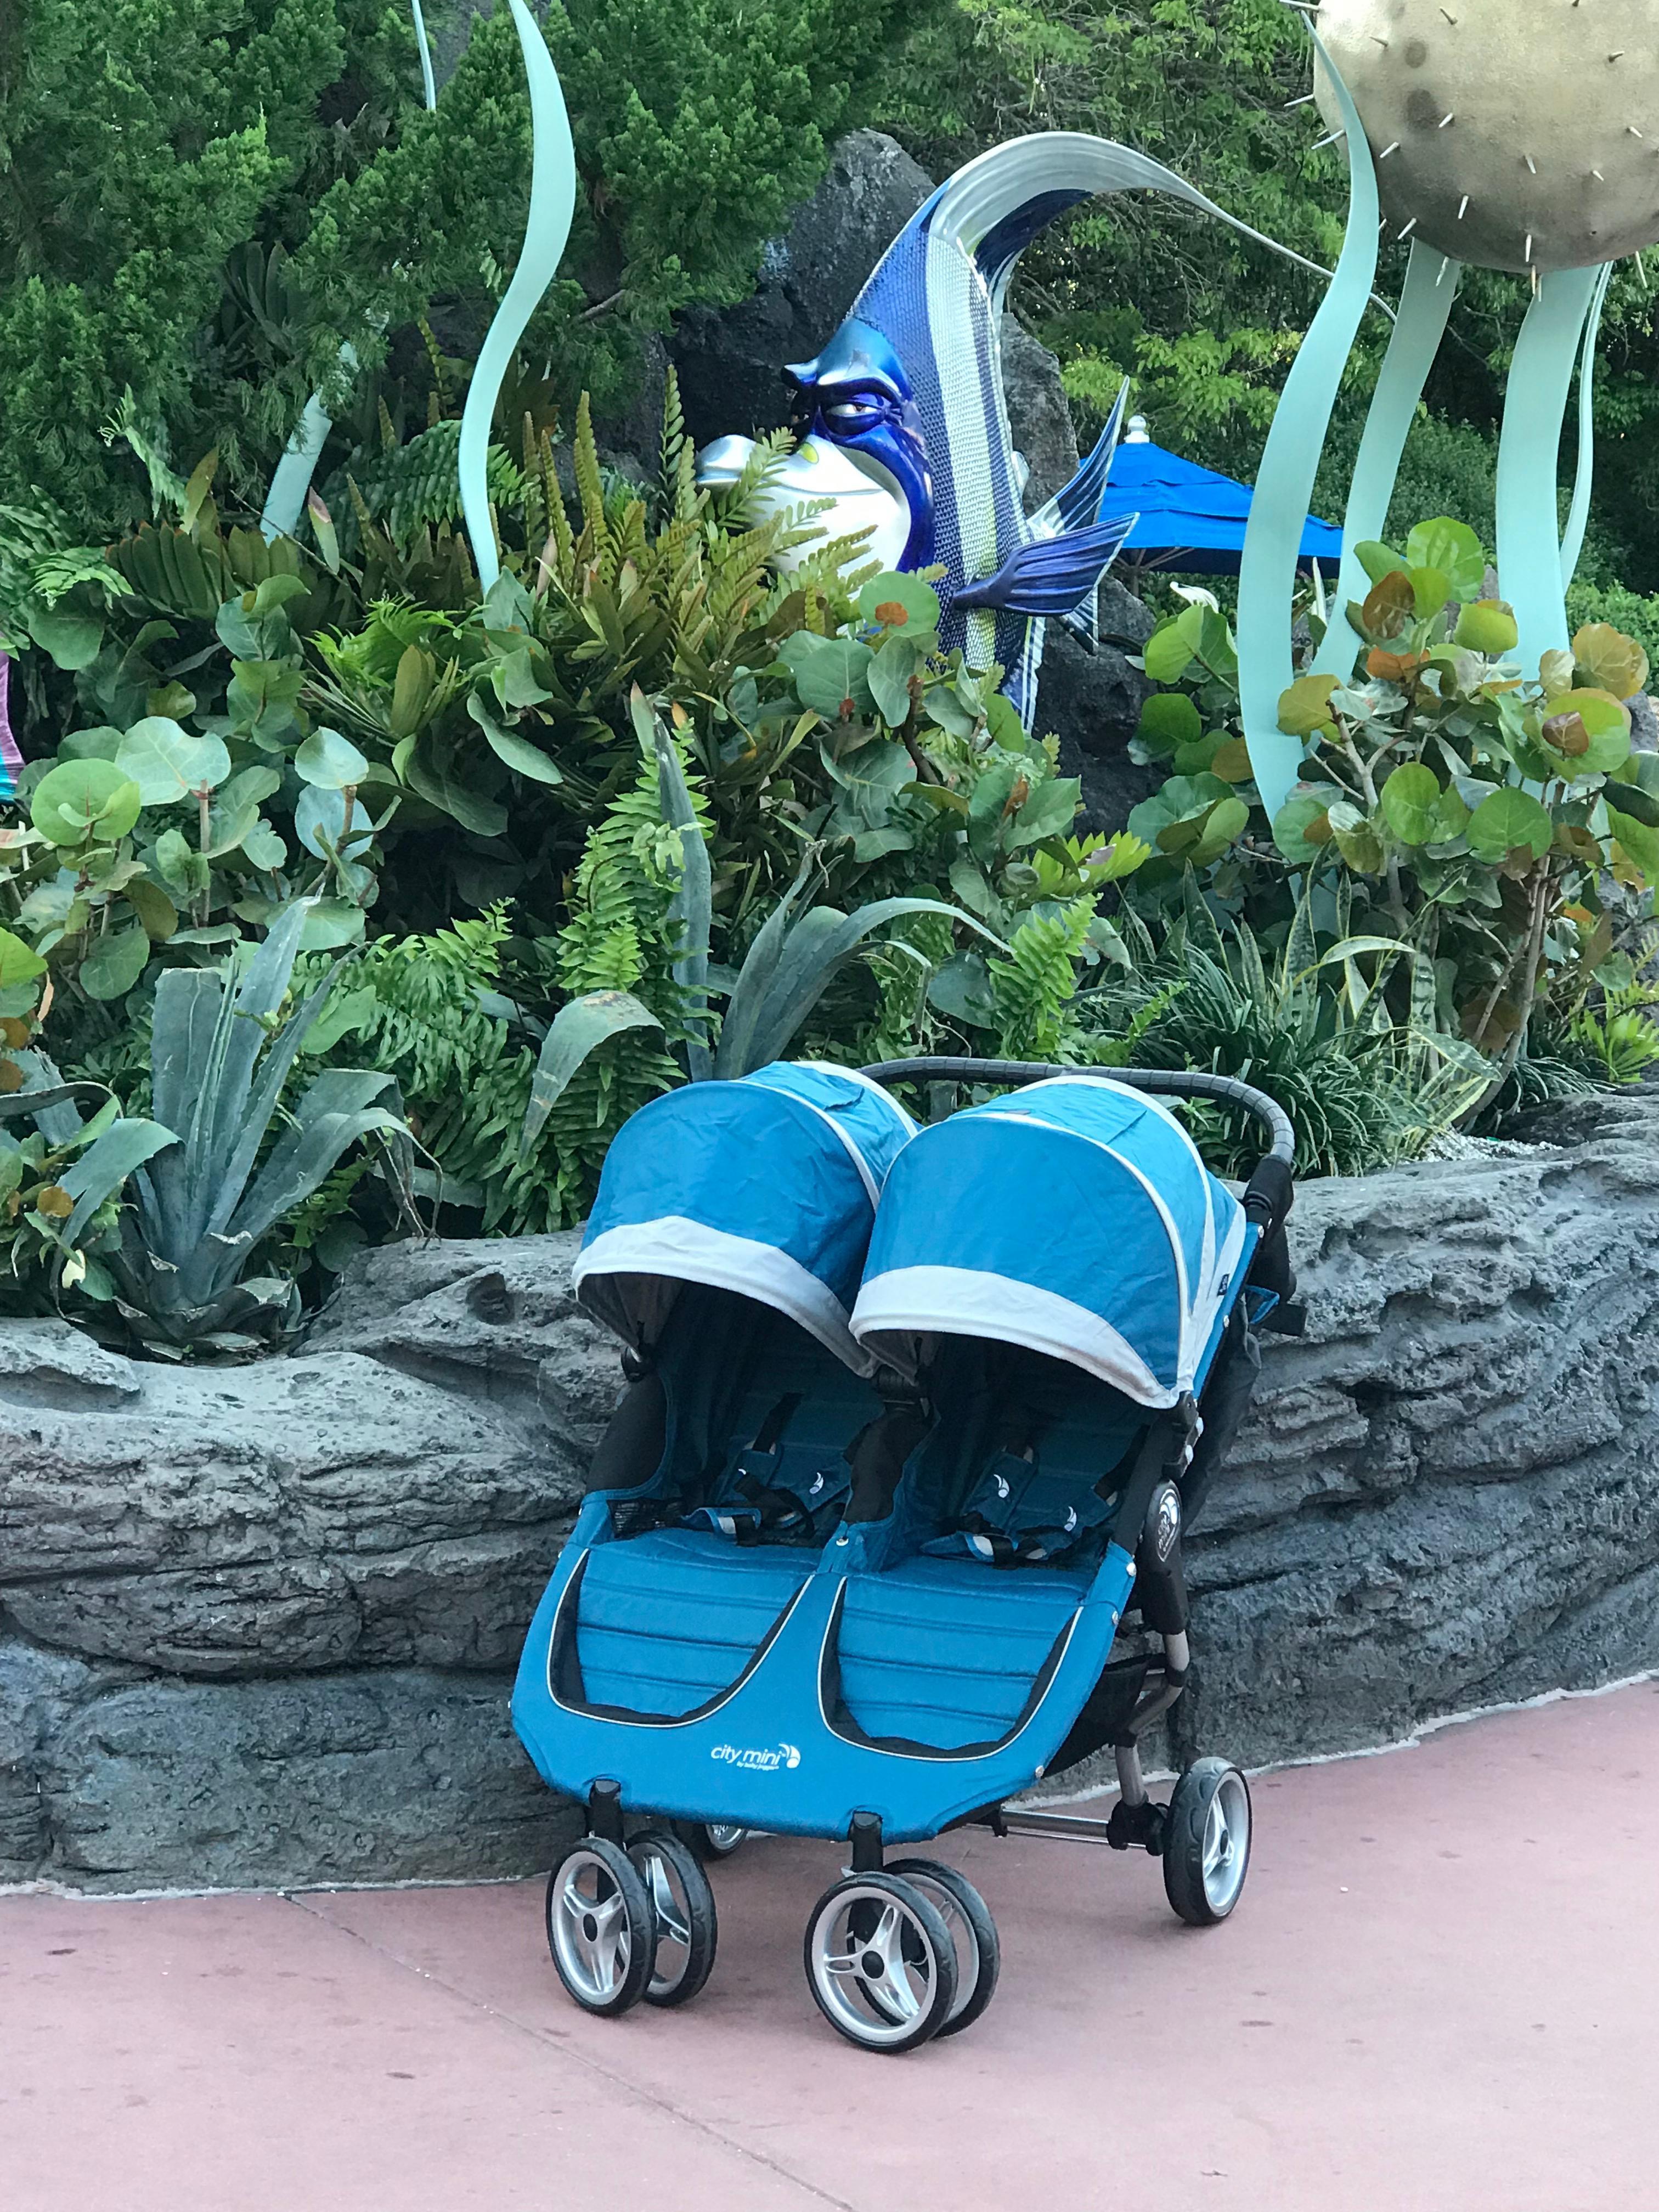 Stroller Rentals Disney image 16